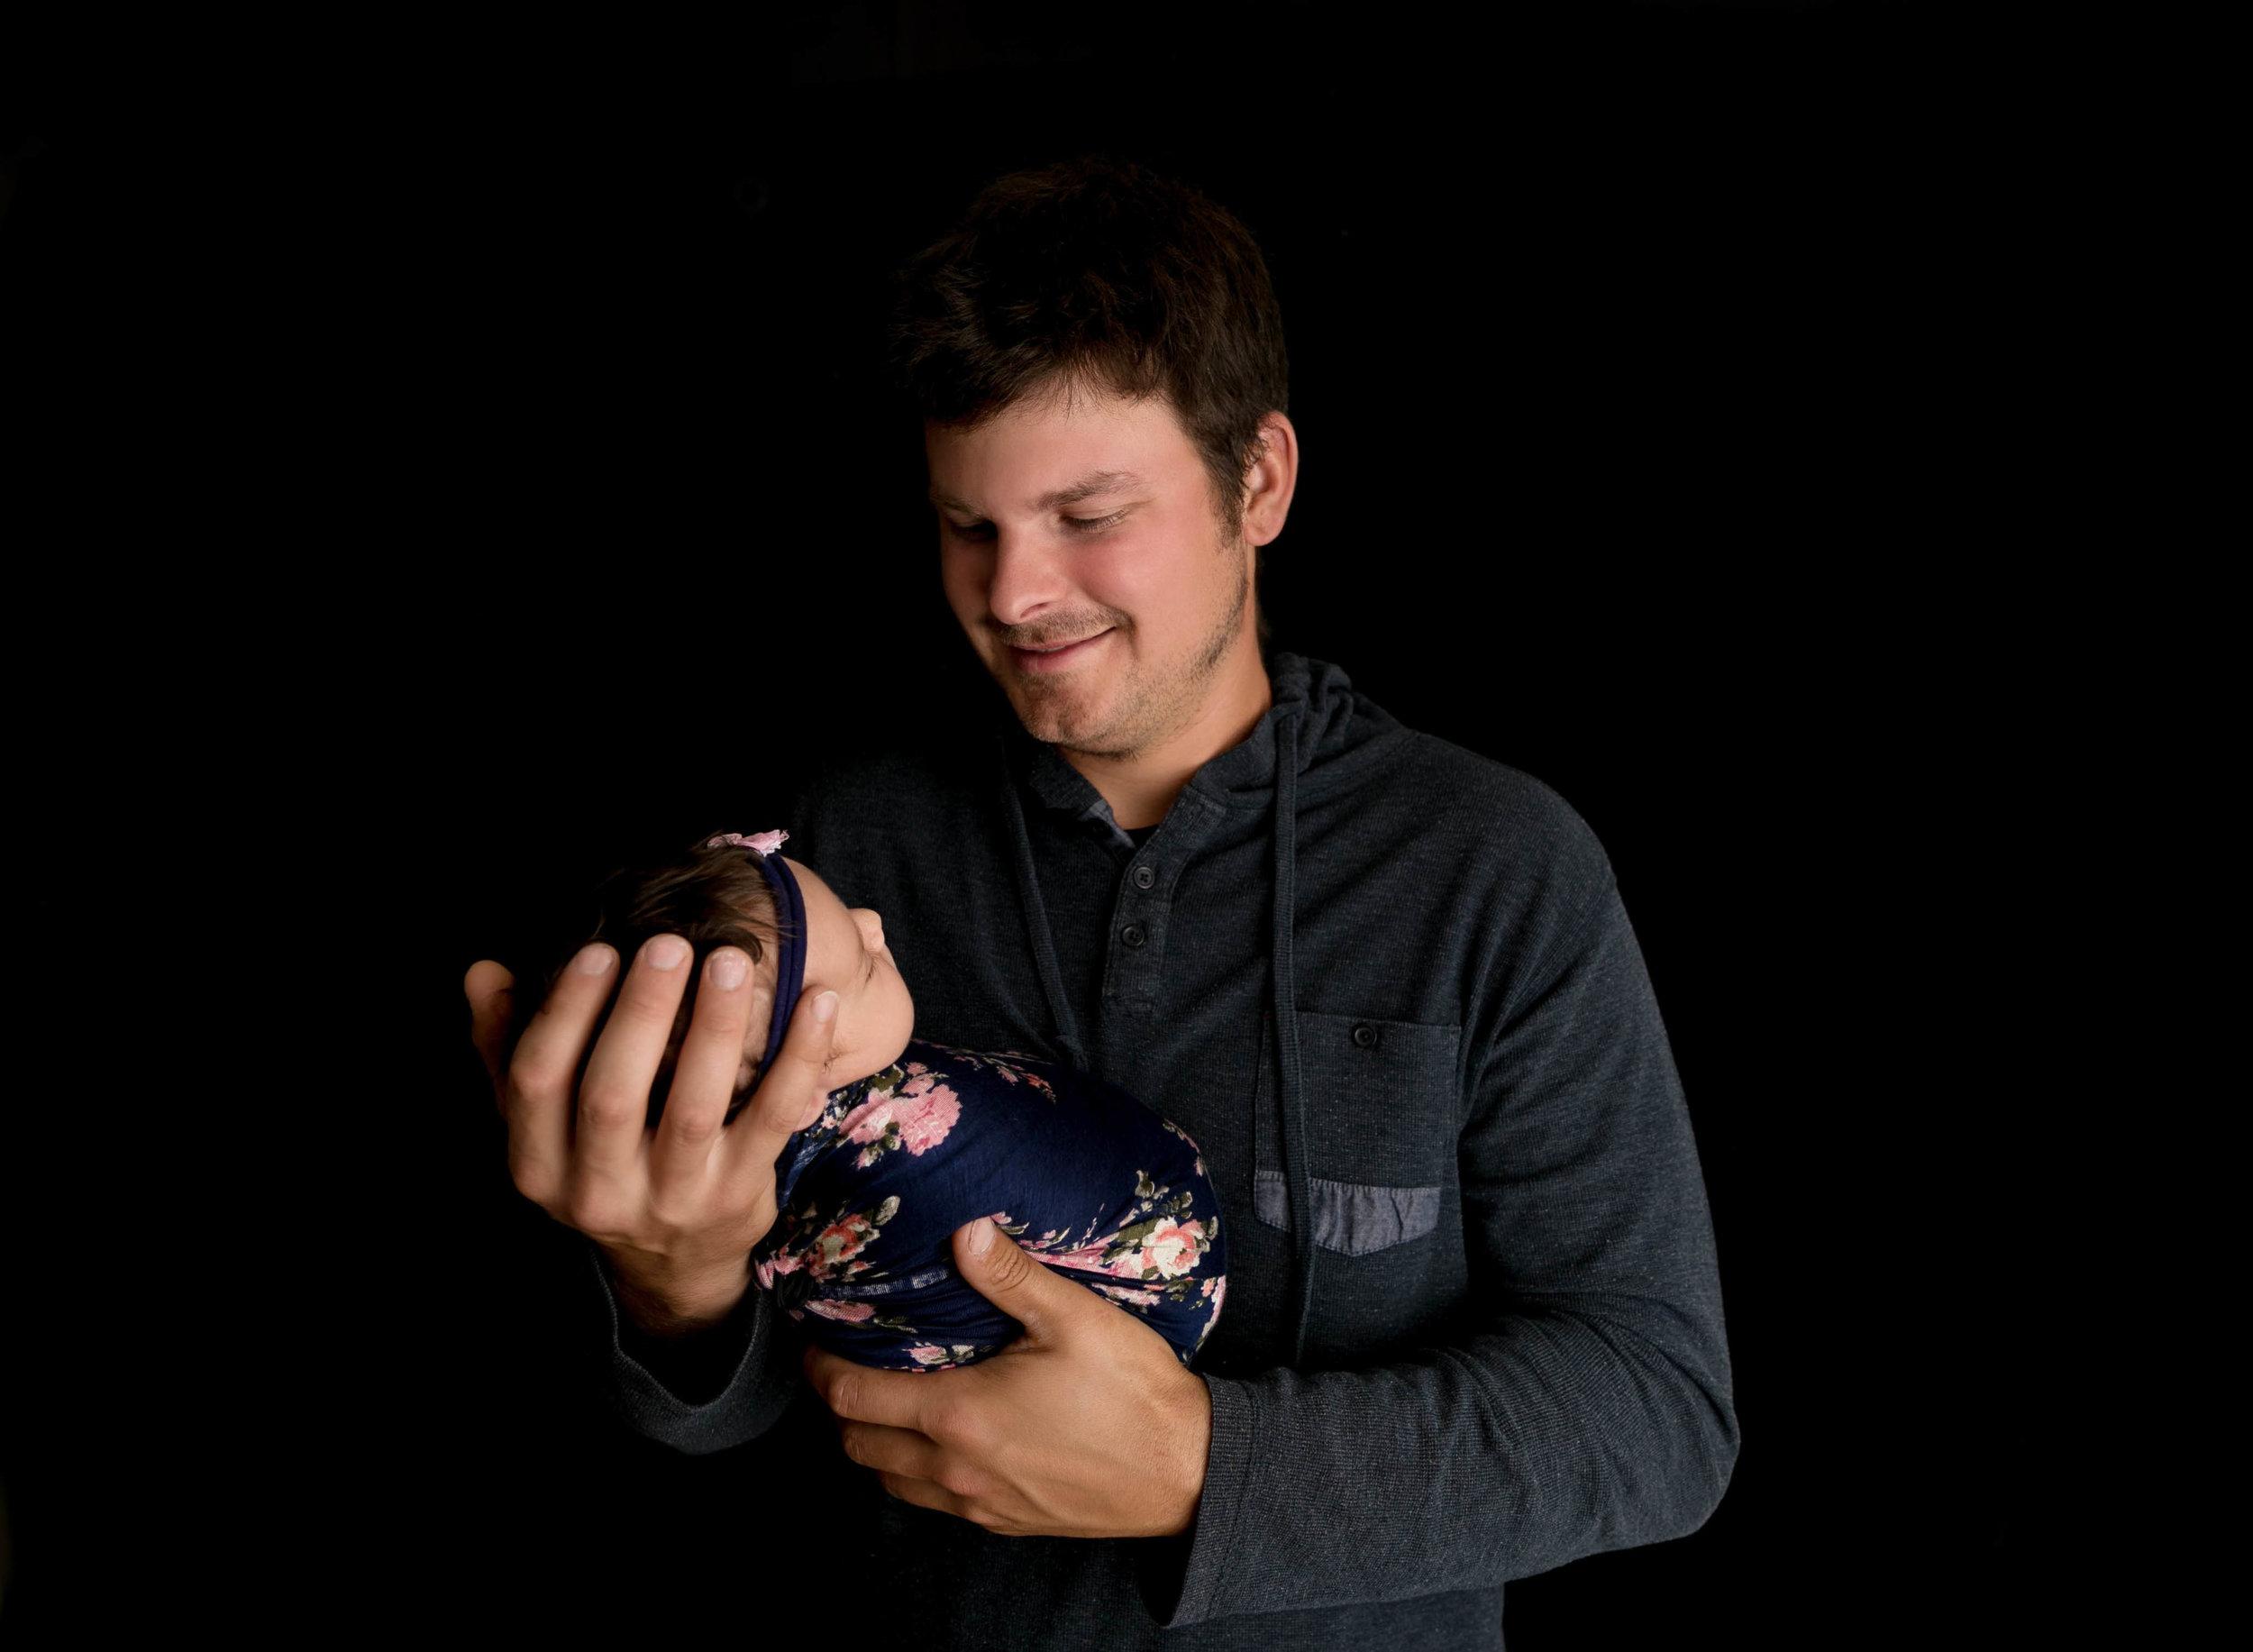 Newborn Photography | Newborn Photographer | Kawartha Lakes Photographer | Lindsay Photographer | Lindsay Ontario Photographer | Kawartha Lakes Photographer | Kawartha Lakes Favourite Photographer | Readers Choice Awards | Morgan Bress Photography | Makenzie Dodds | Megan Dodds